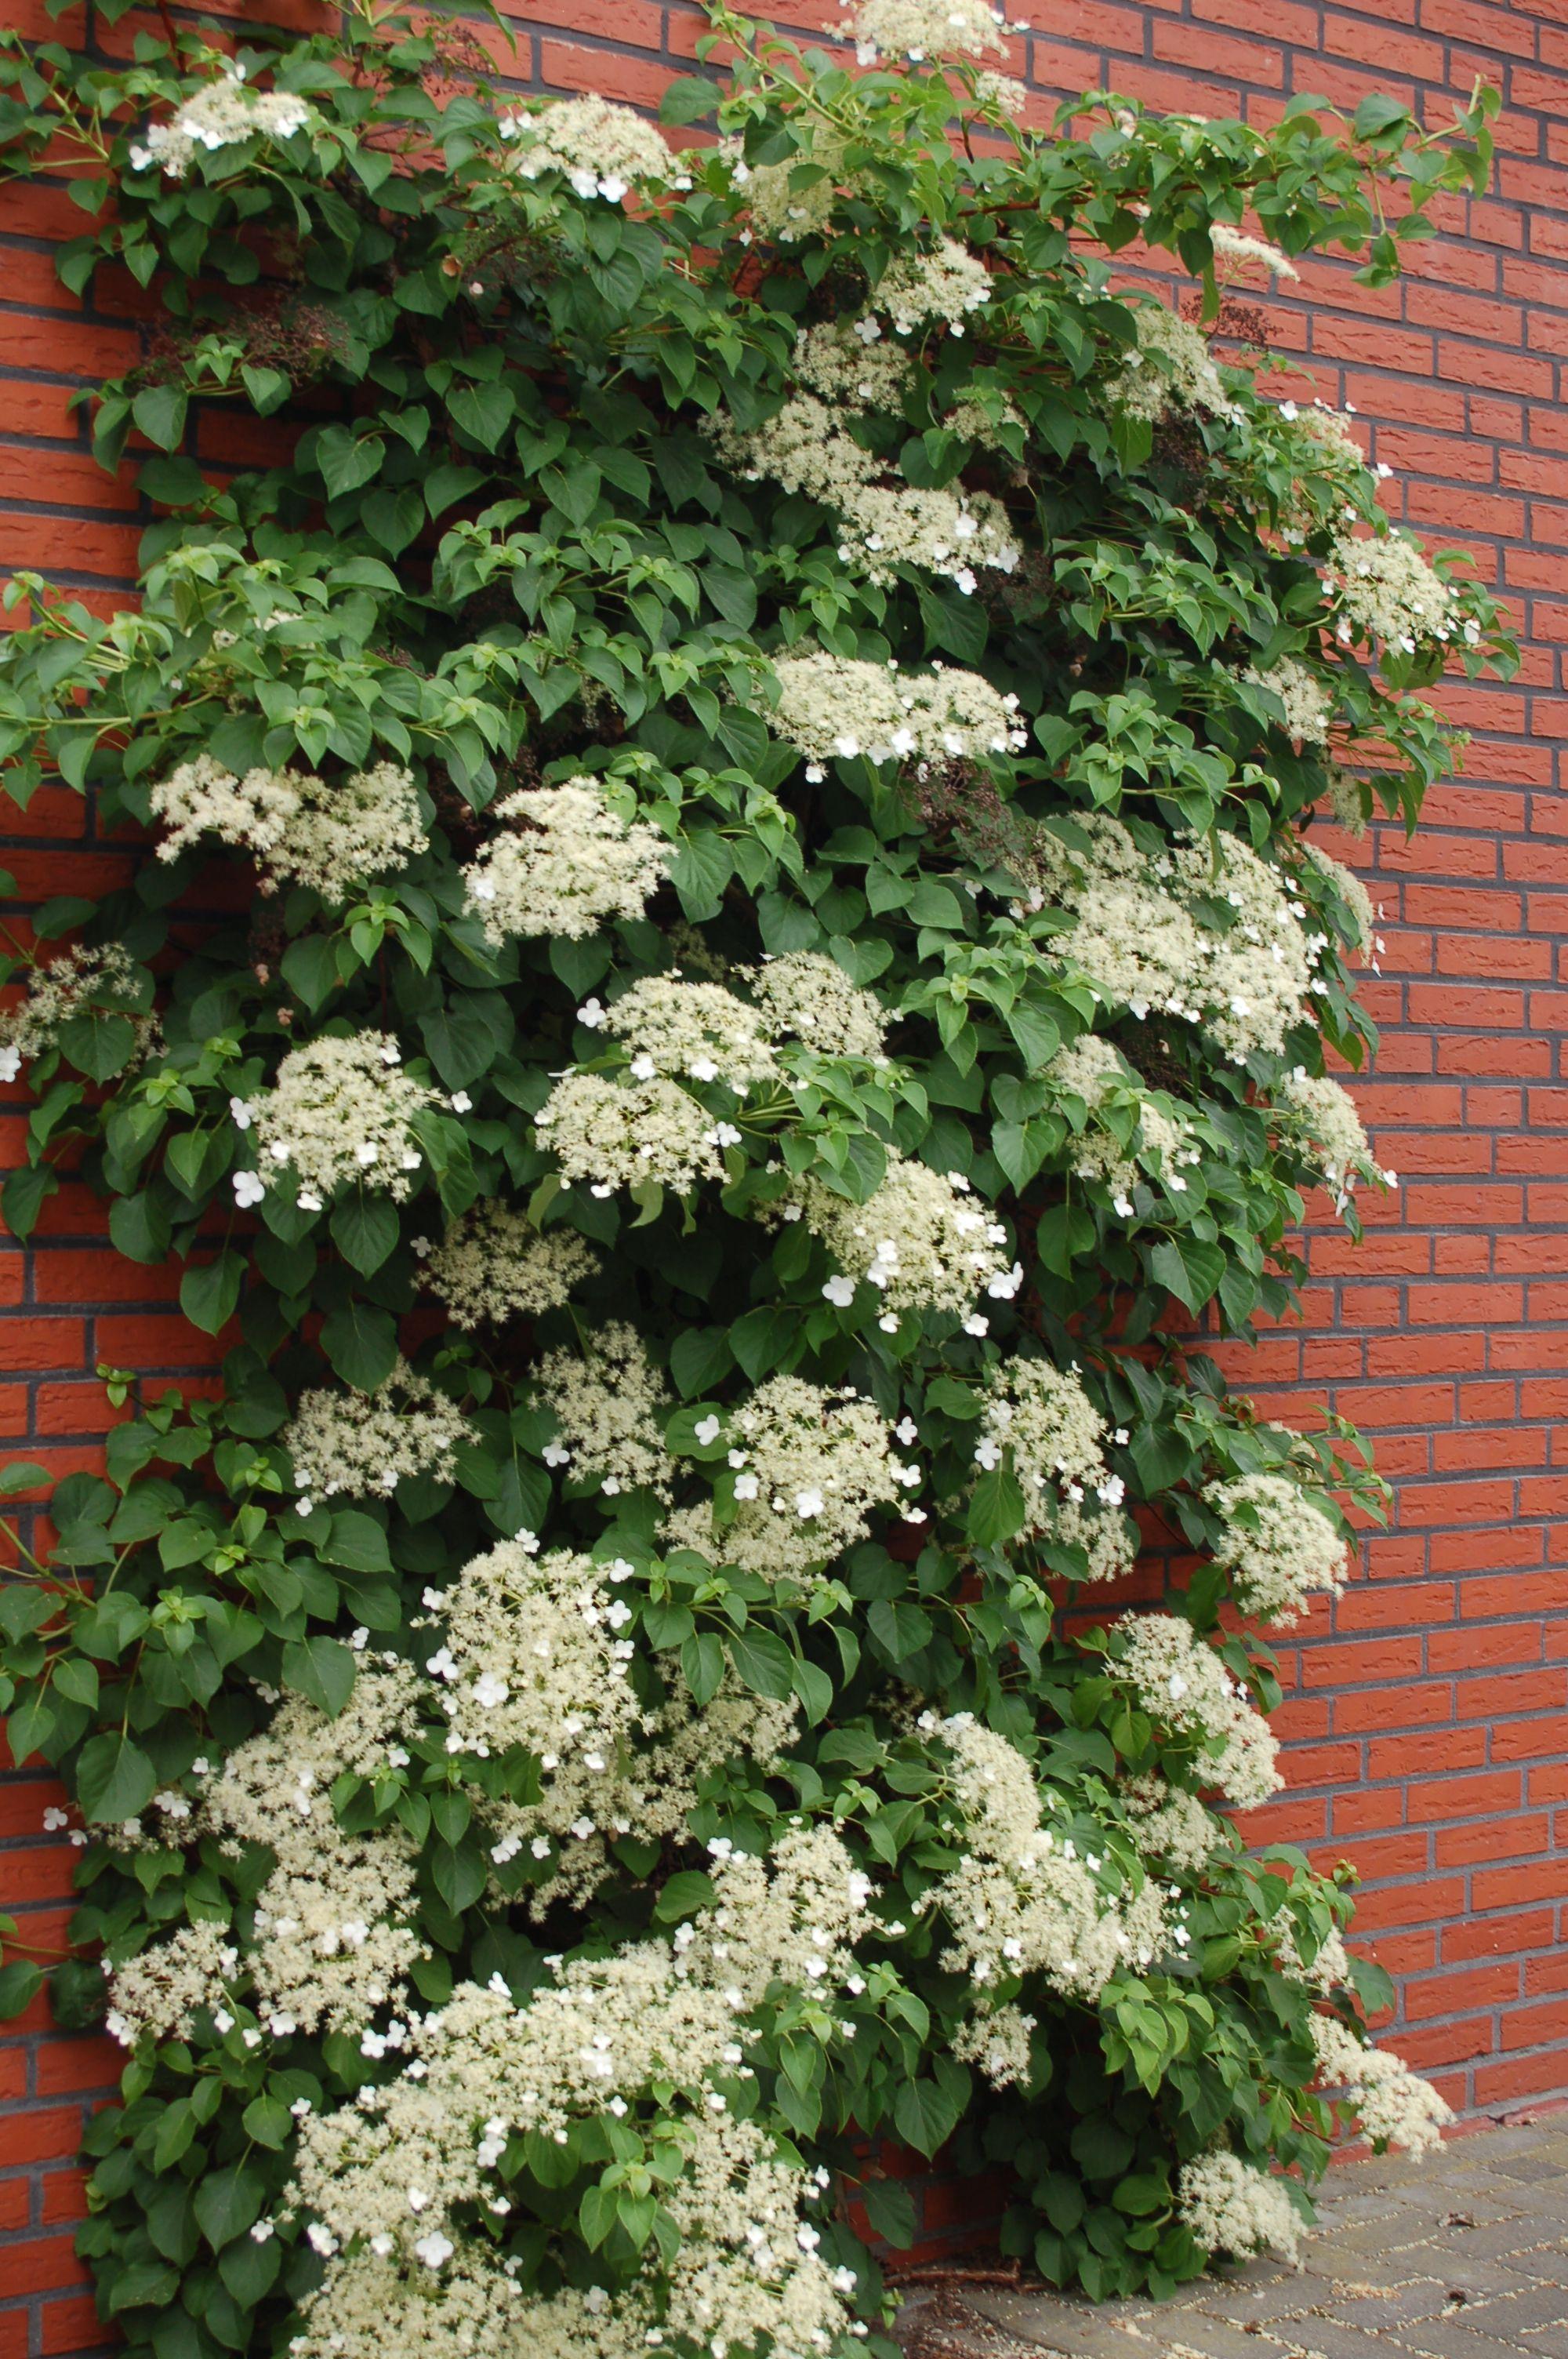 clematis kletterpflanze tipps pflegen garten terrasse balkon teich, Gartengerate ideen